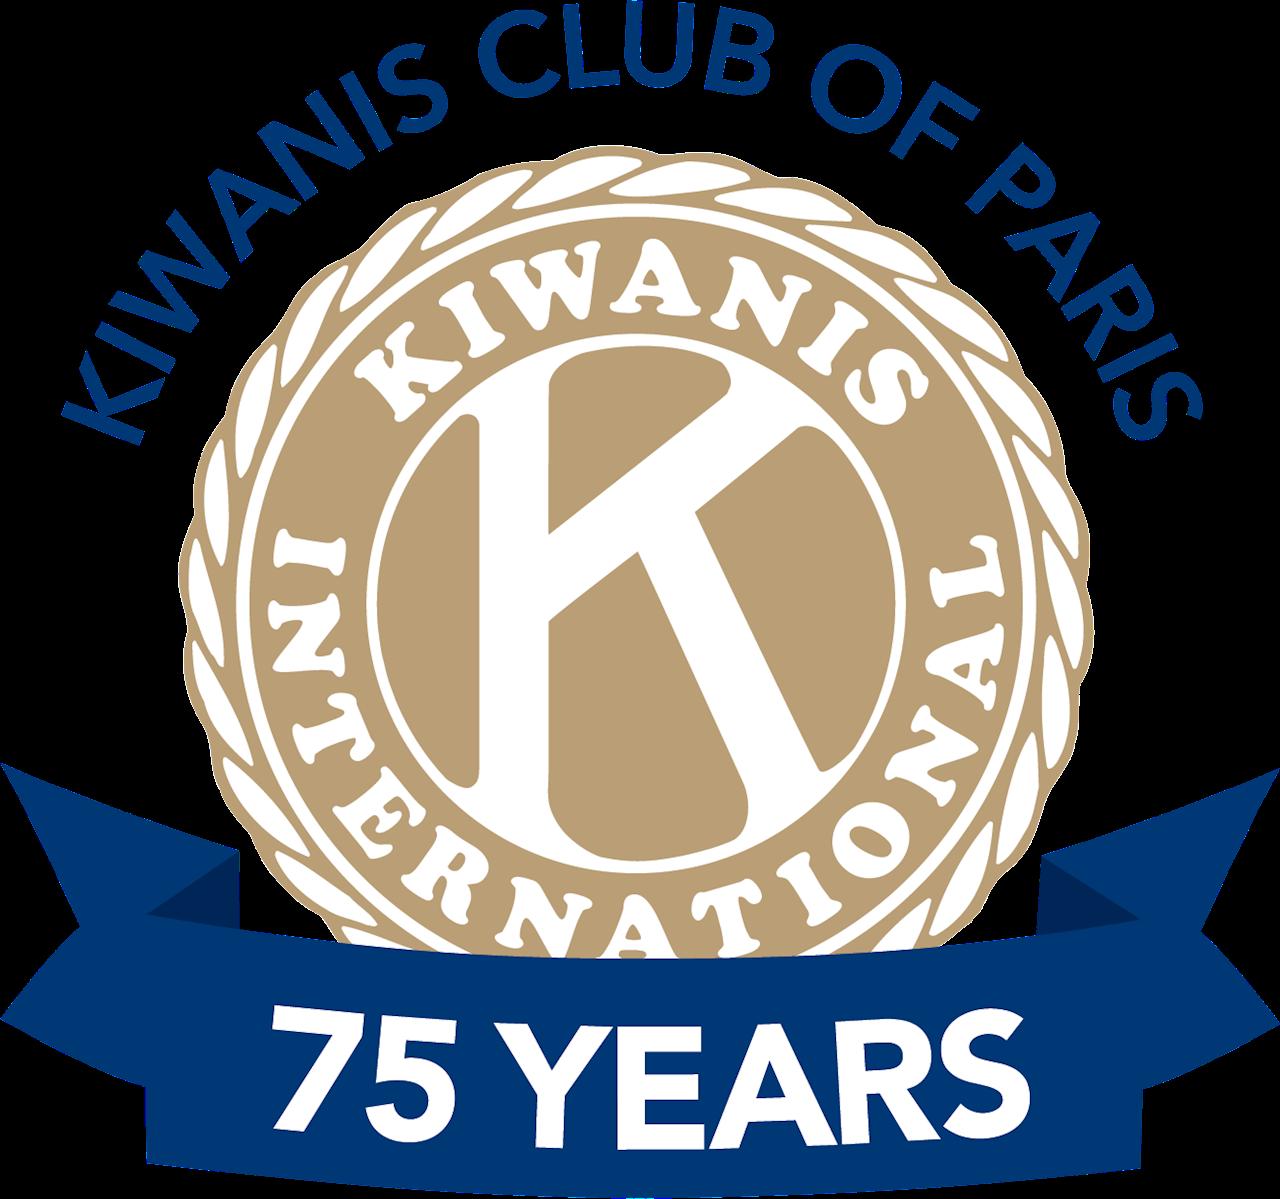 Paris - Kiwanis International